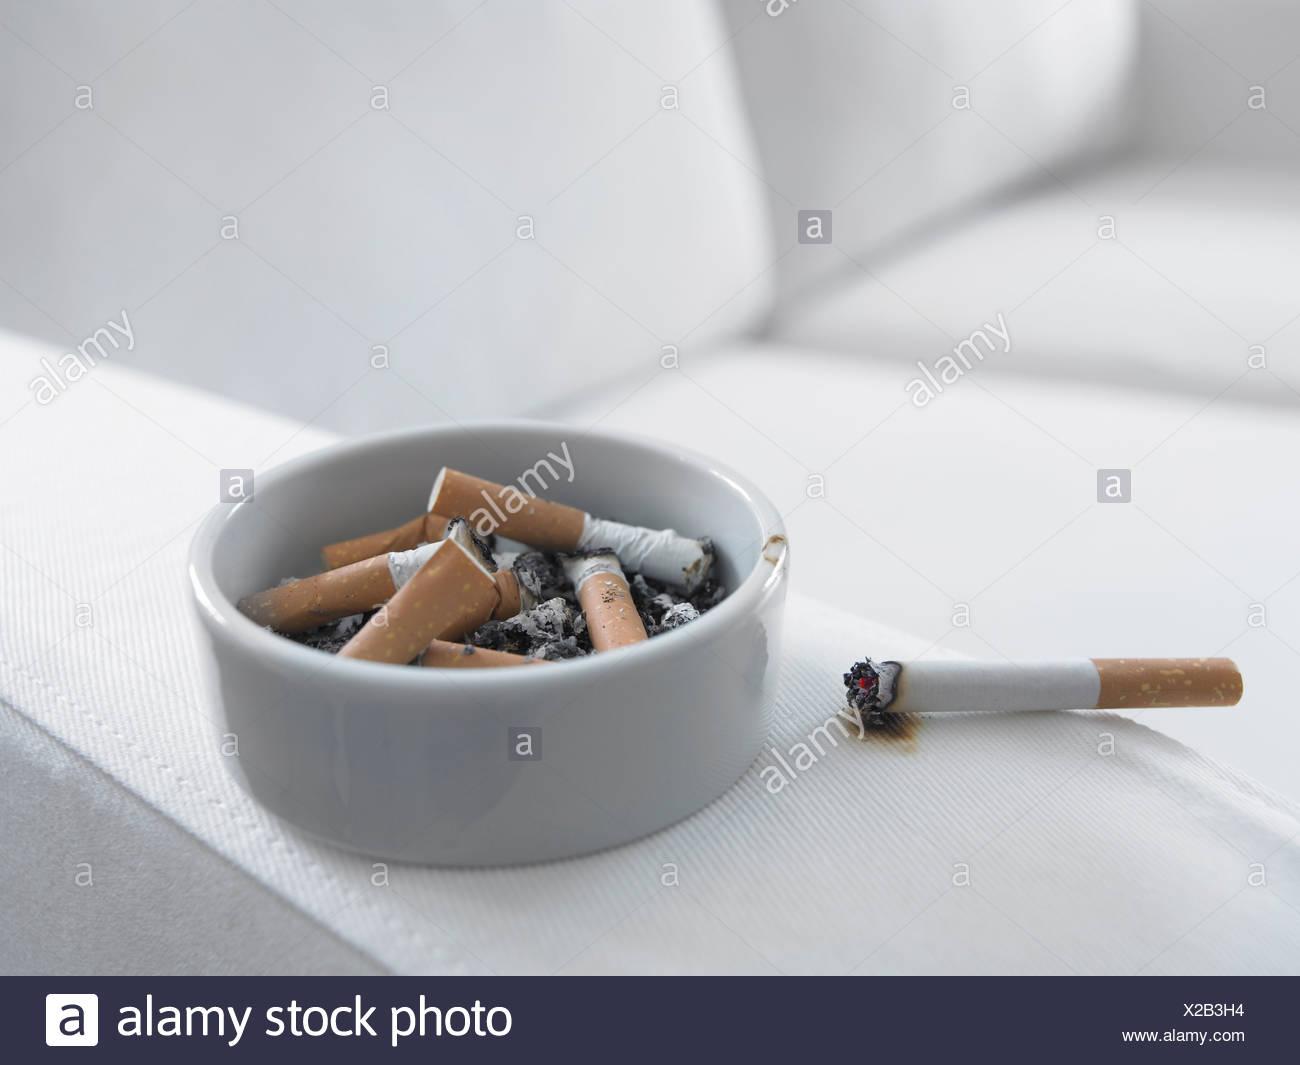 Cigarette burning arm of sofa - Stock Image